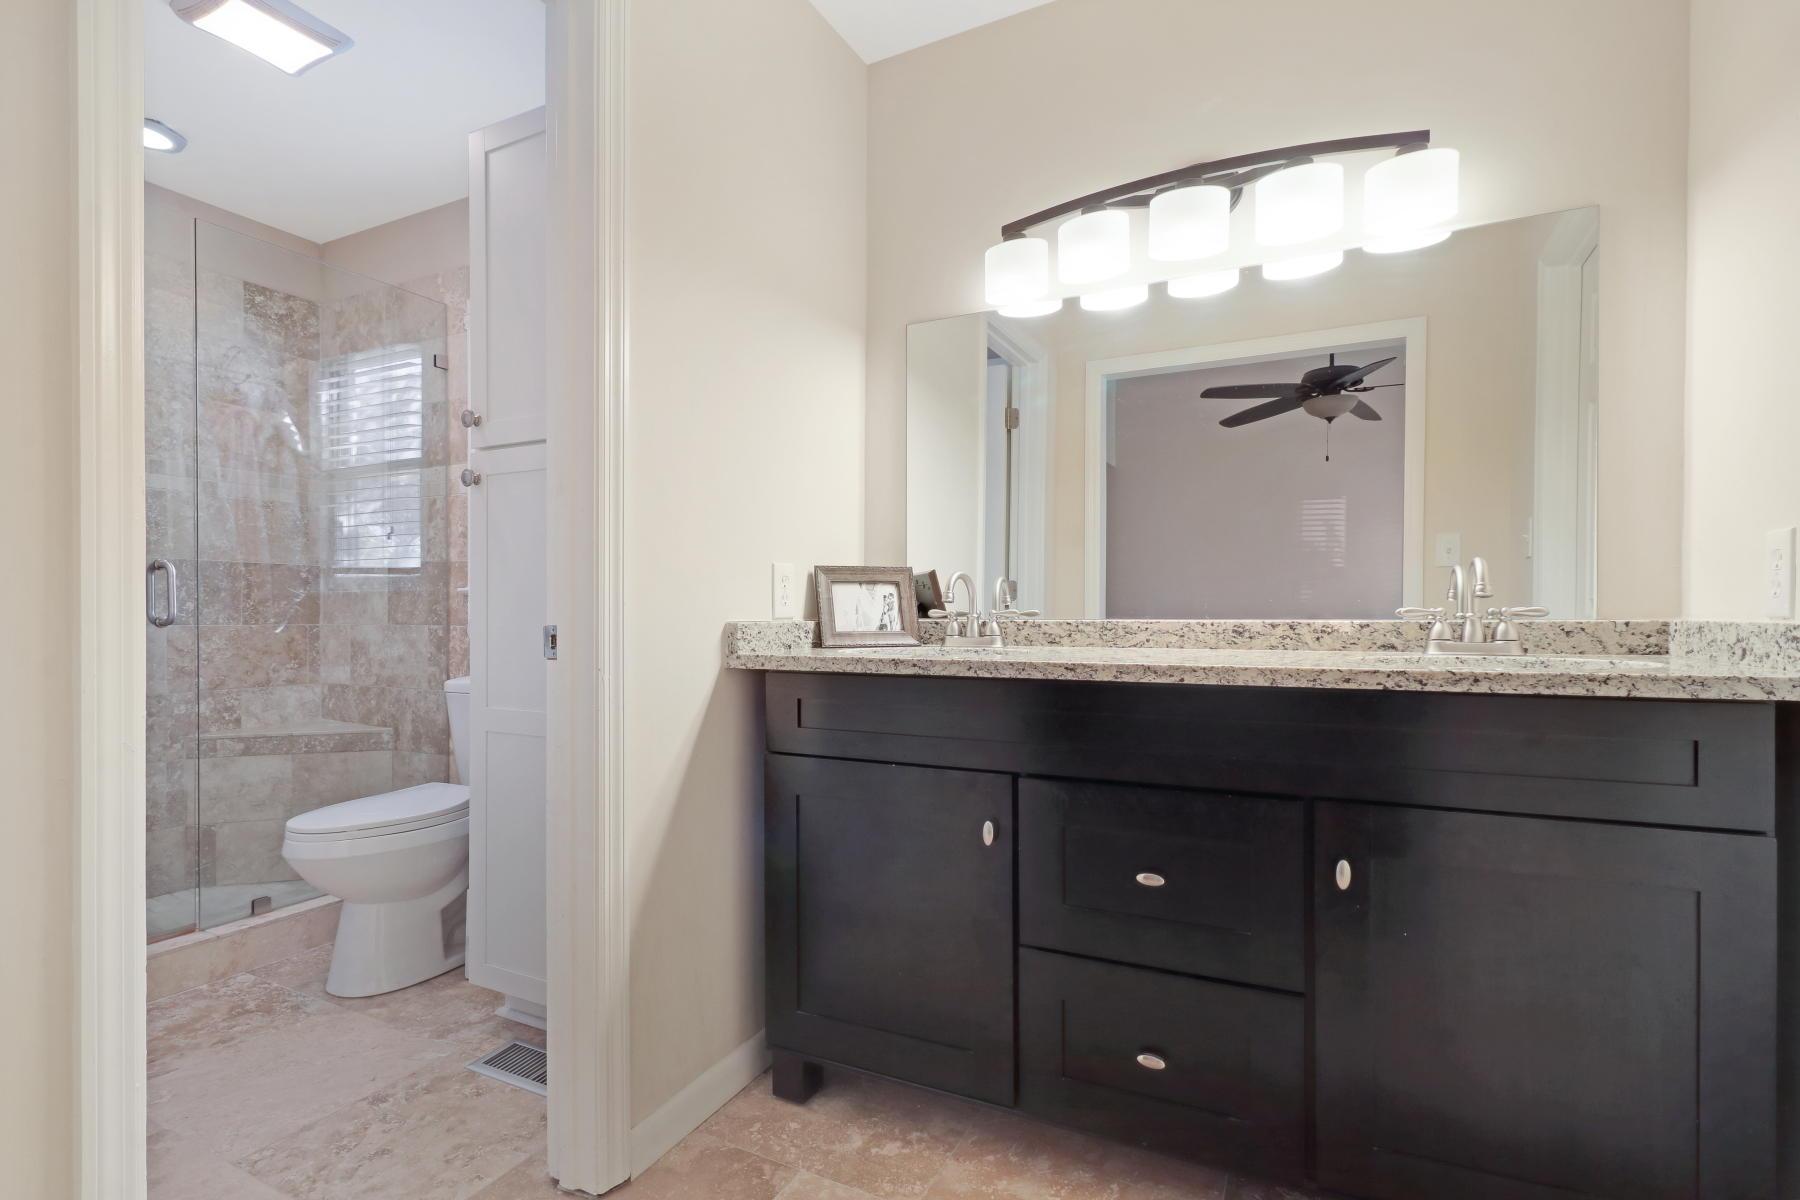 Harrison Acres Homes For Sale - 51 Markfield, Charleston, SC - 14